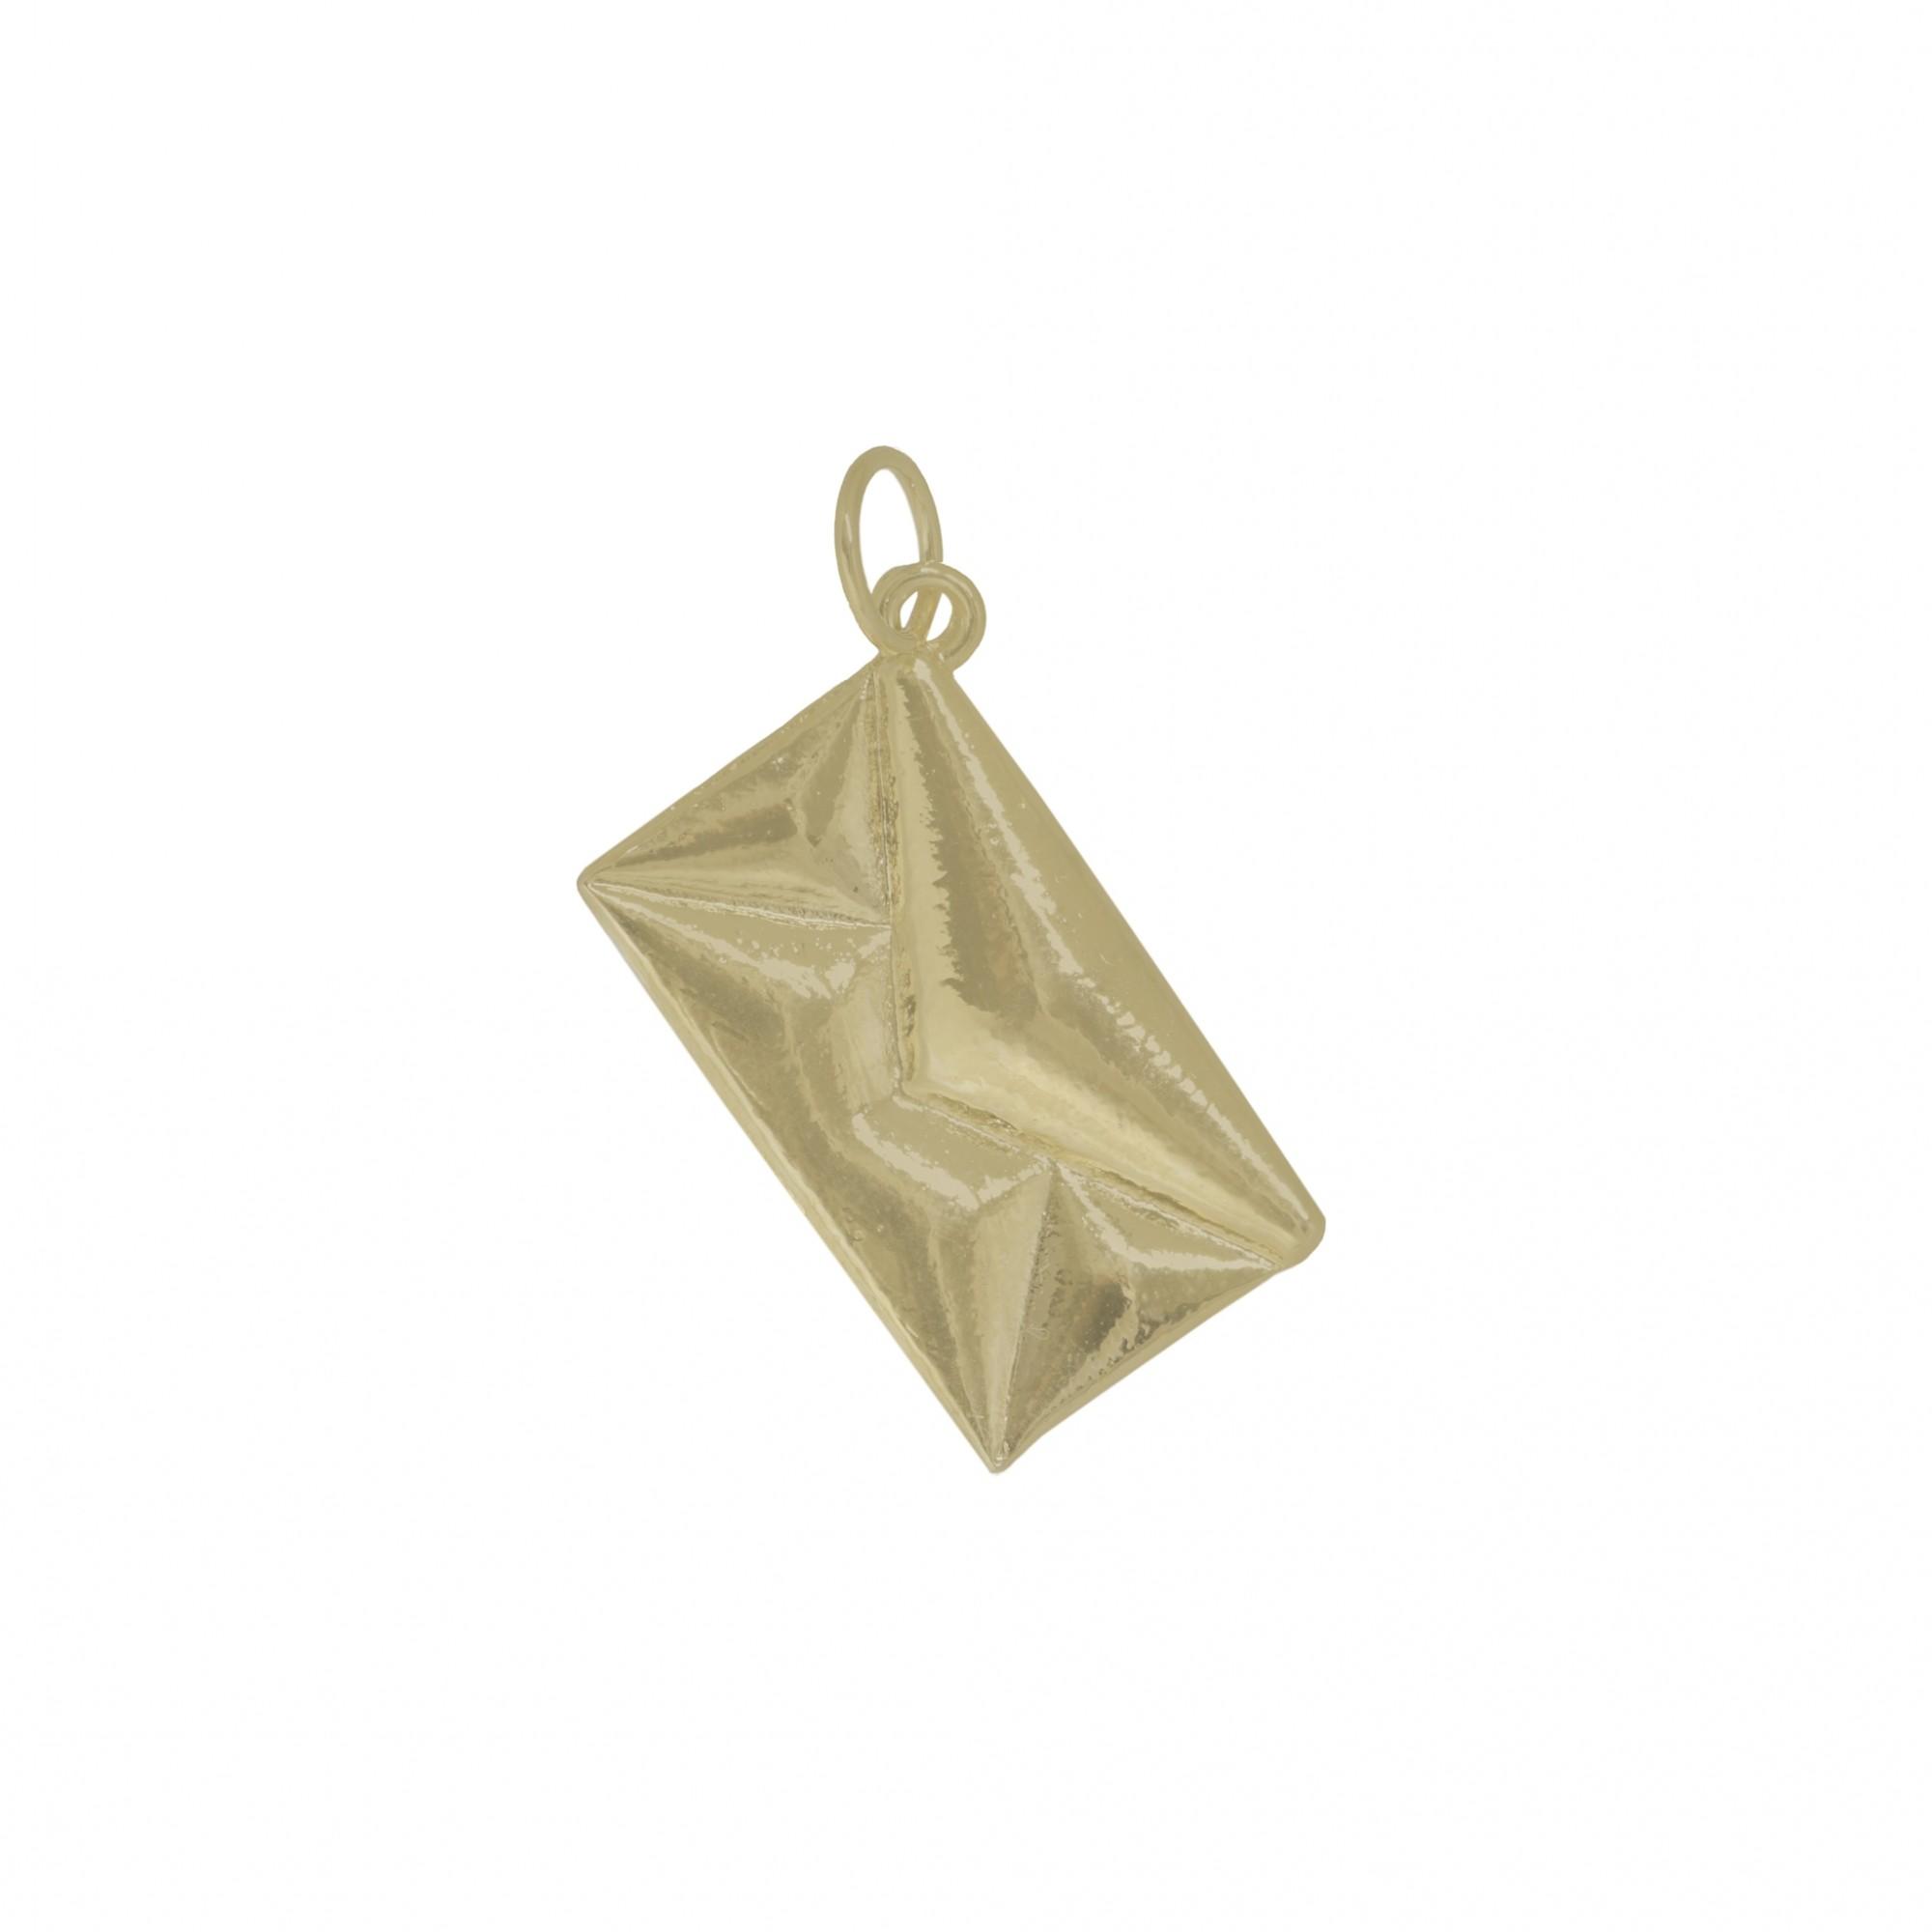 Pingente semijoia carta lisa folheado ouro / prata e verniz